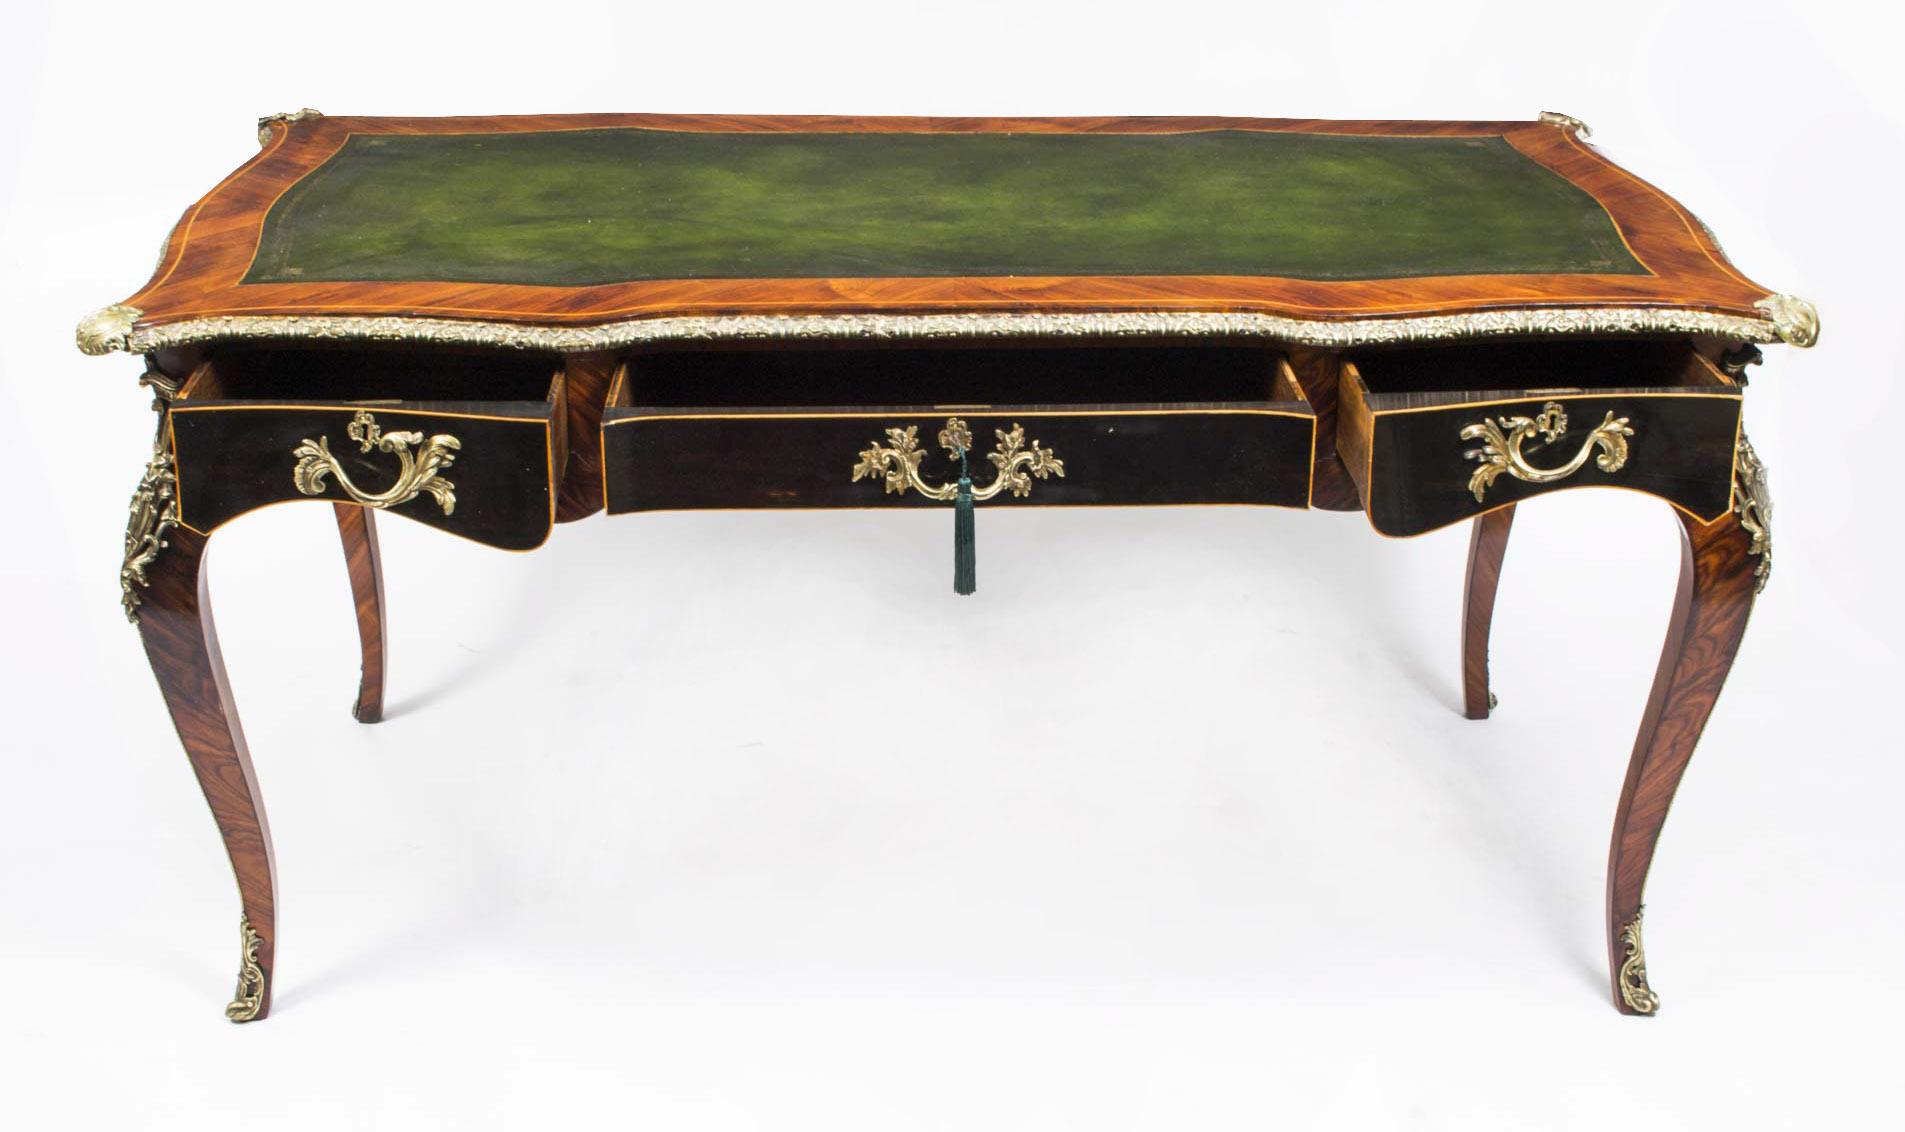 regent antiques desks and writing tables antique french writing table desk bureau plat. Black Bedroom Furniture Sets. Home Design Ideas